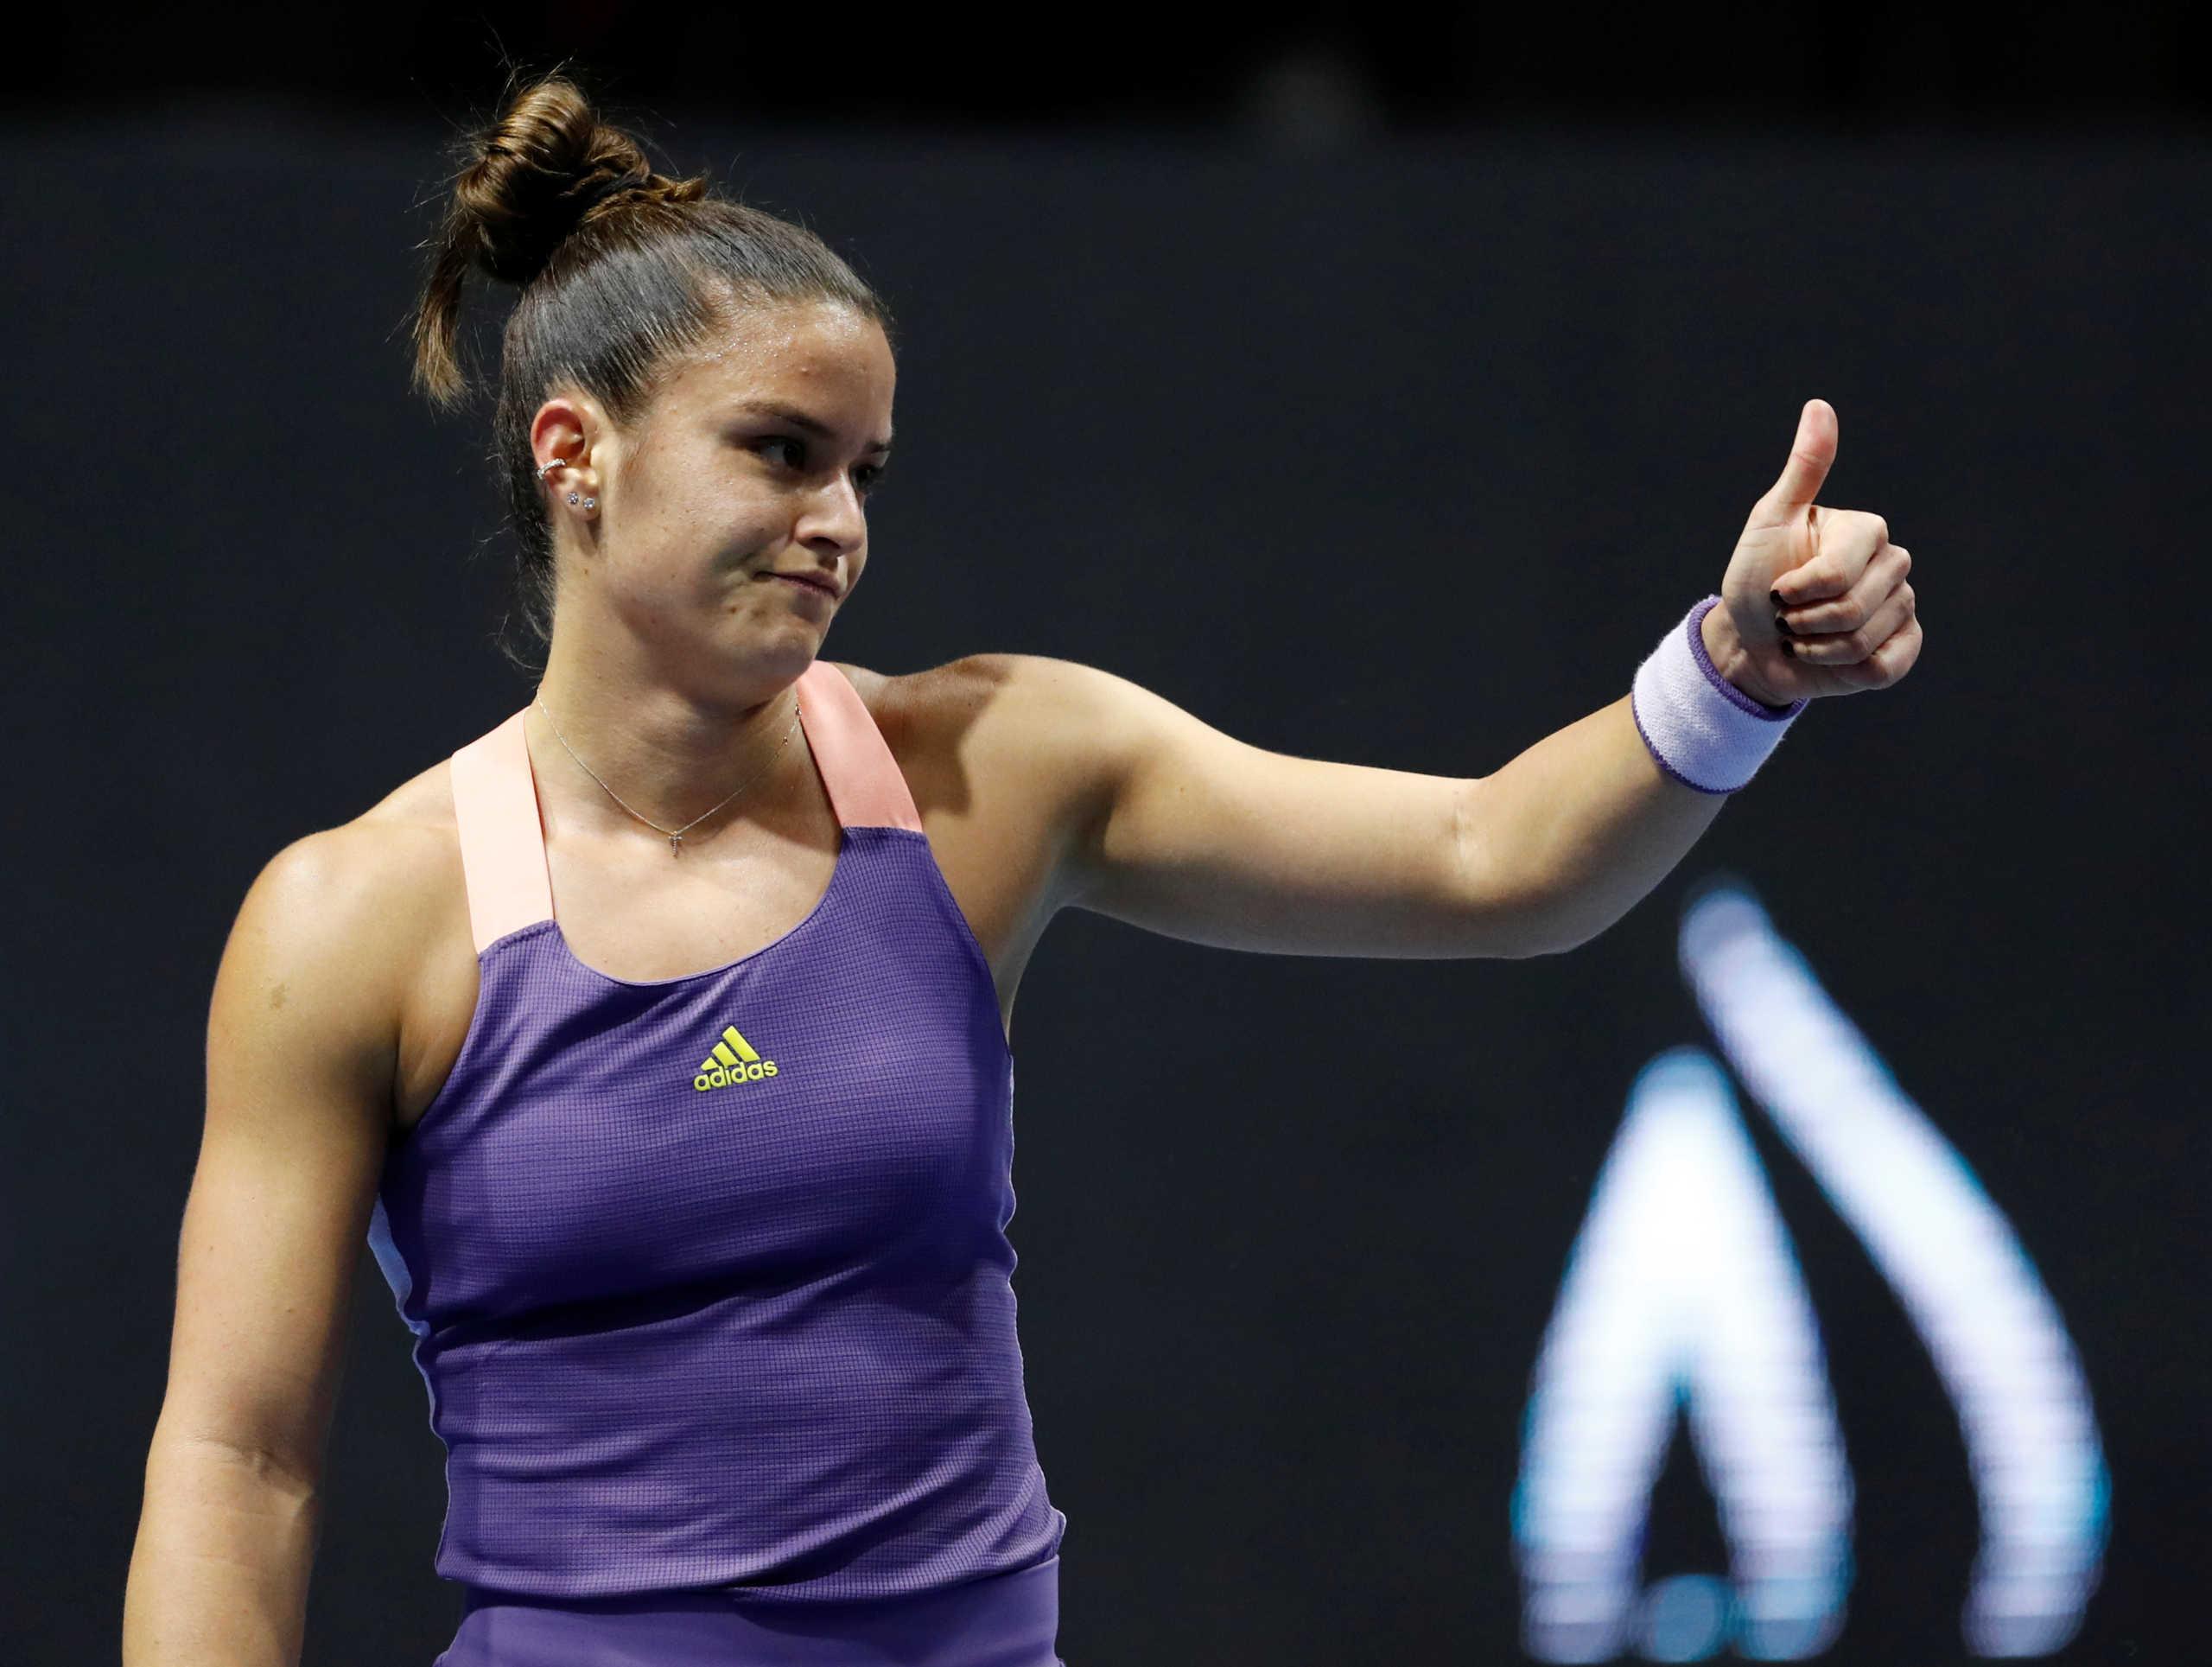 US Open: Η Μαρία Σάκκαρη θέλει να γράψει ιστορία κόντρα στην Σερένα Γουίλιαμς